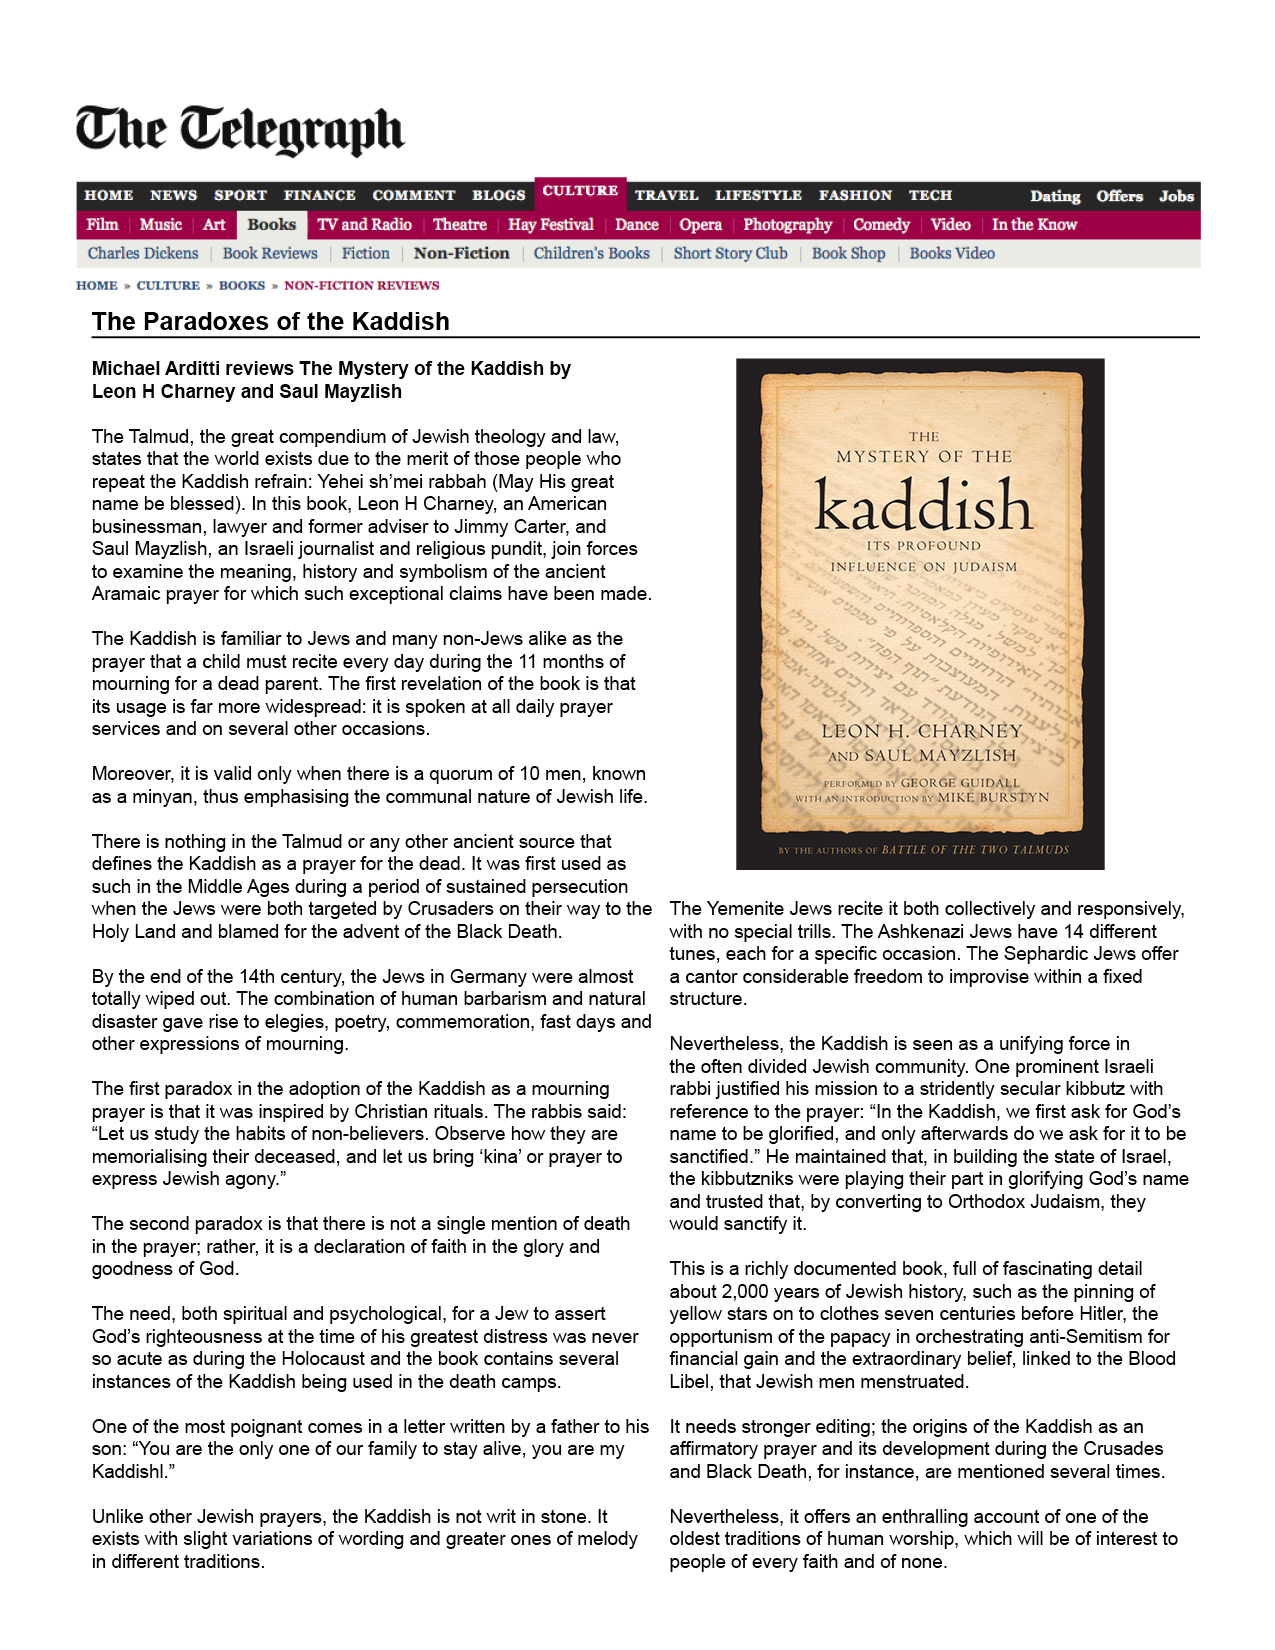 sunday telegraph reserve reviews